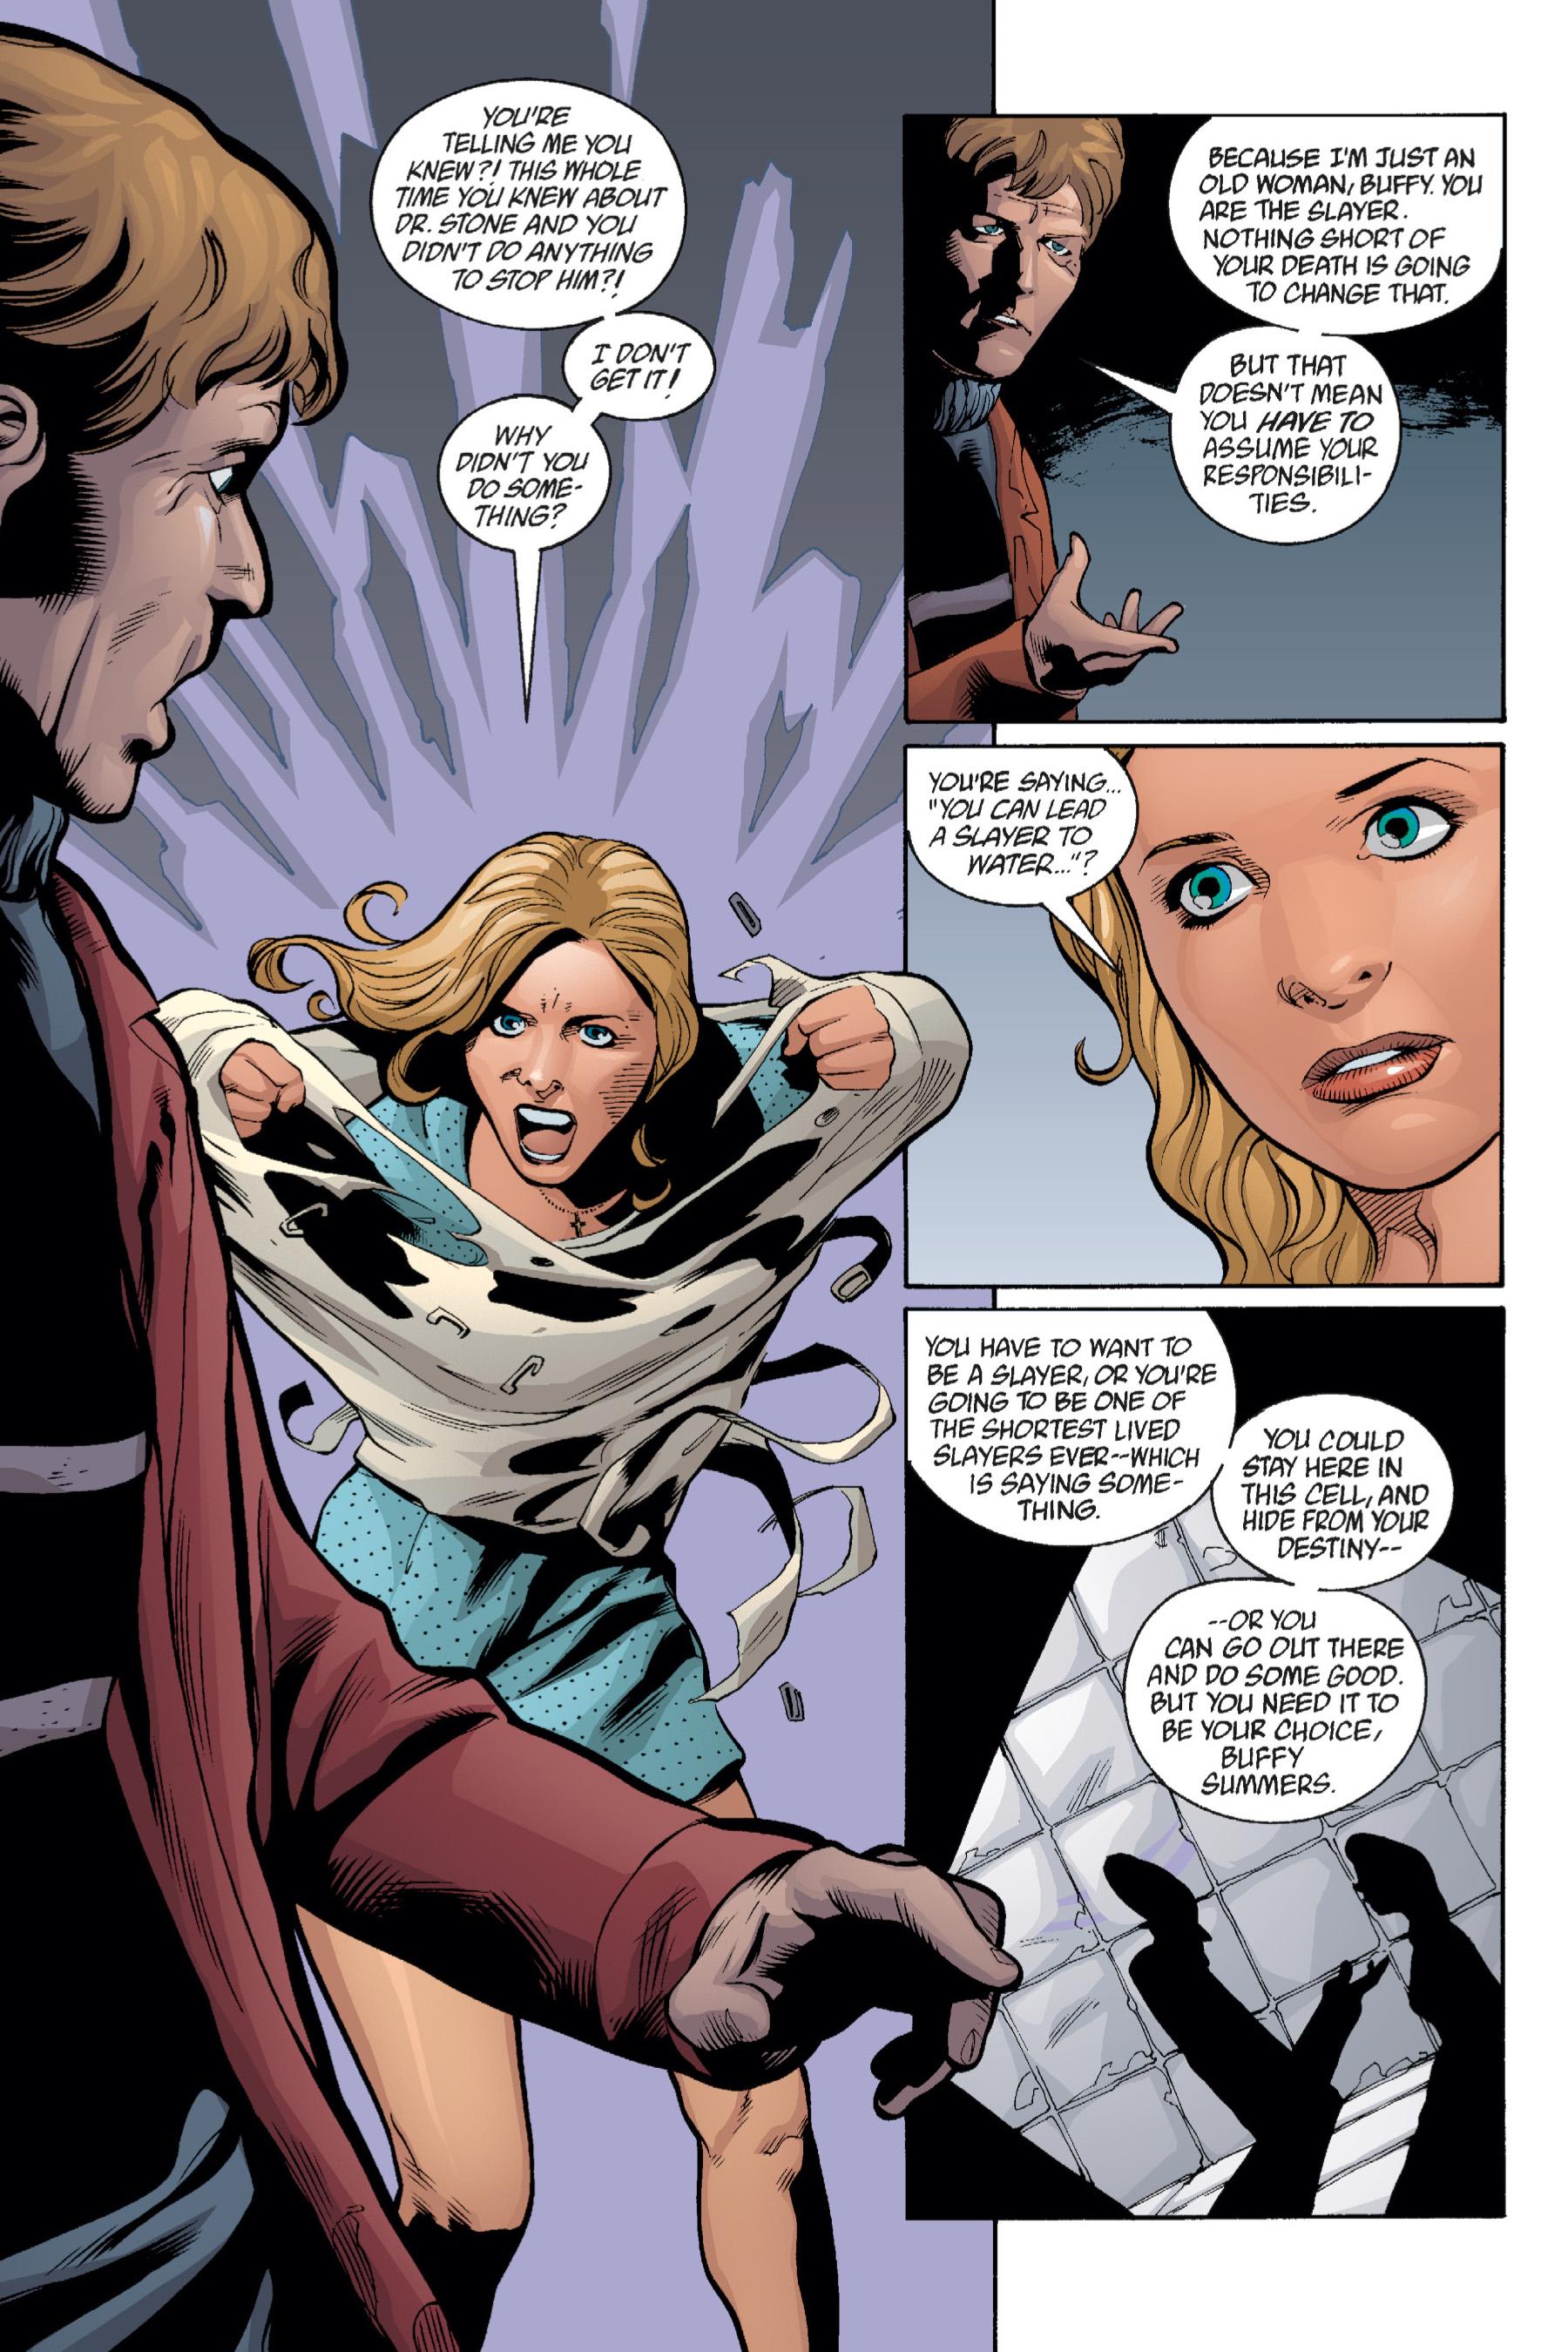 Read online Buffy the Vampire Slayer: Omnibus comic -  Issue # TPB 1 - 289